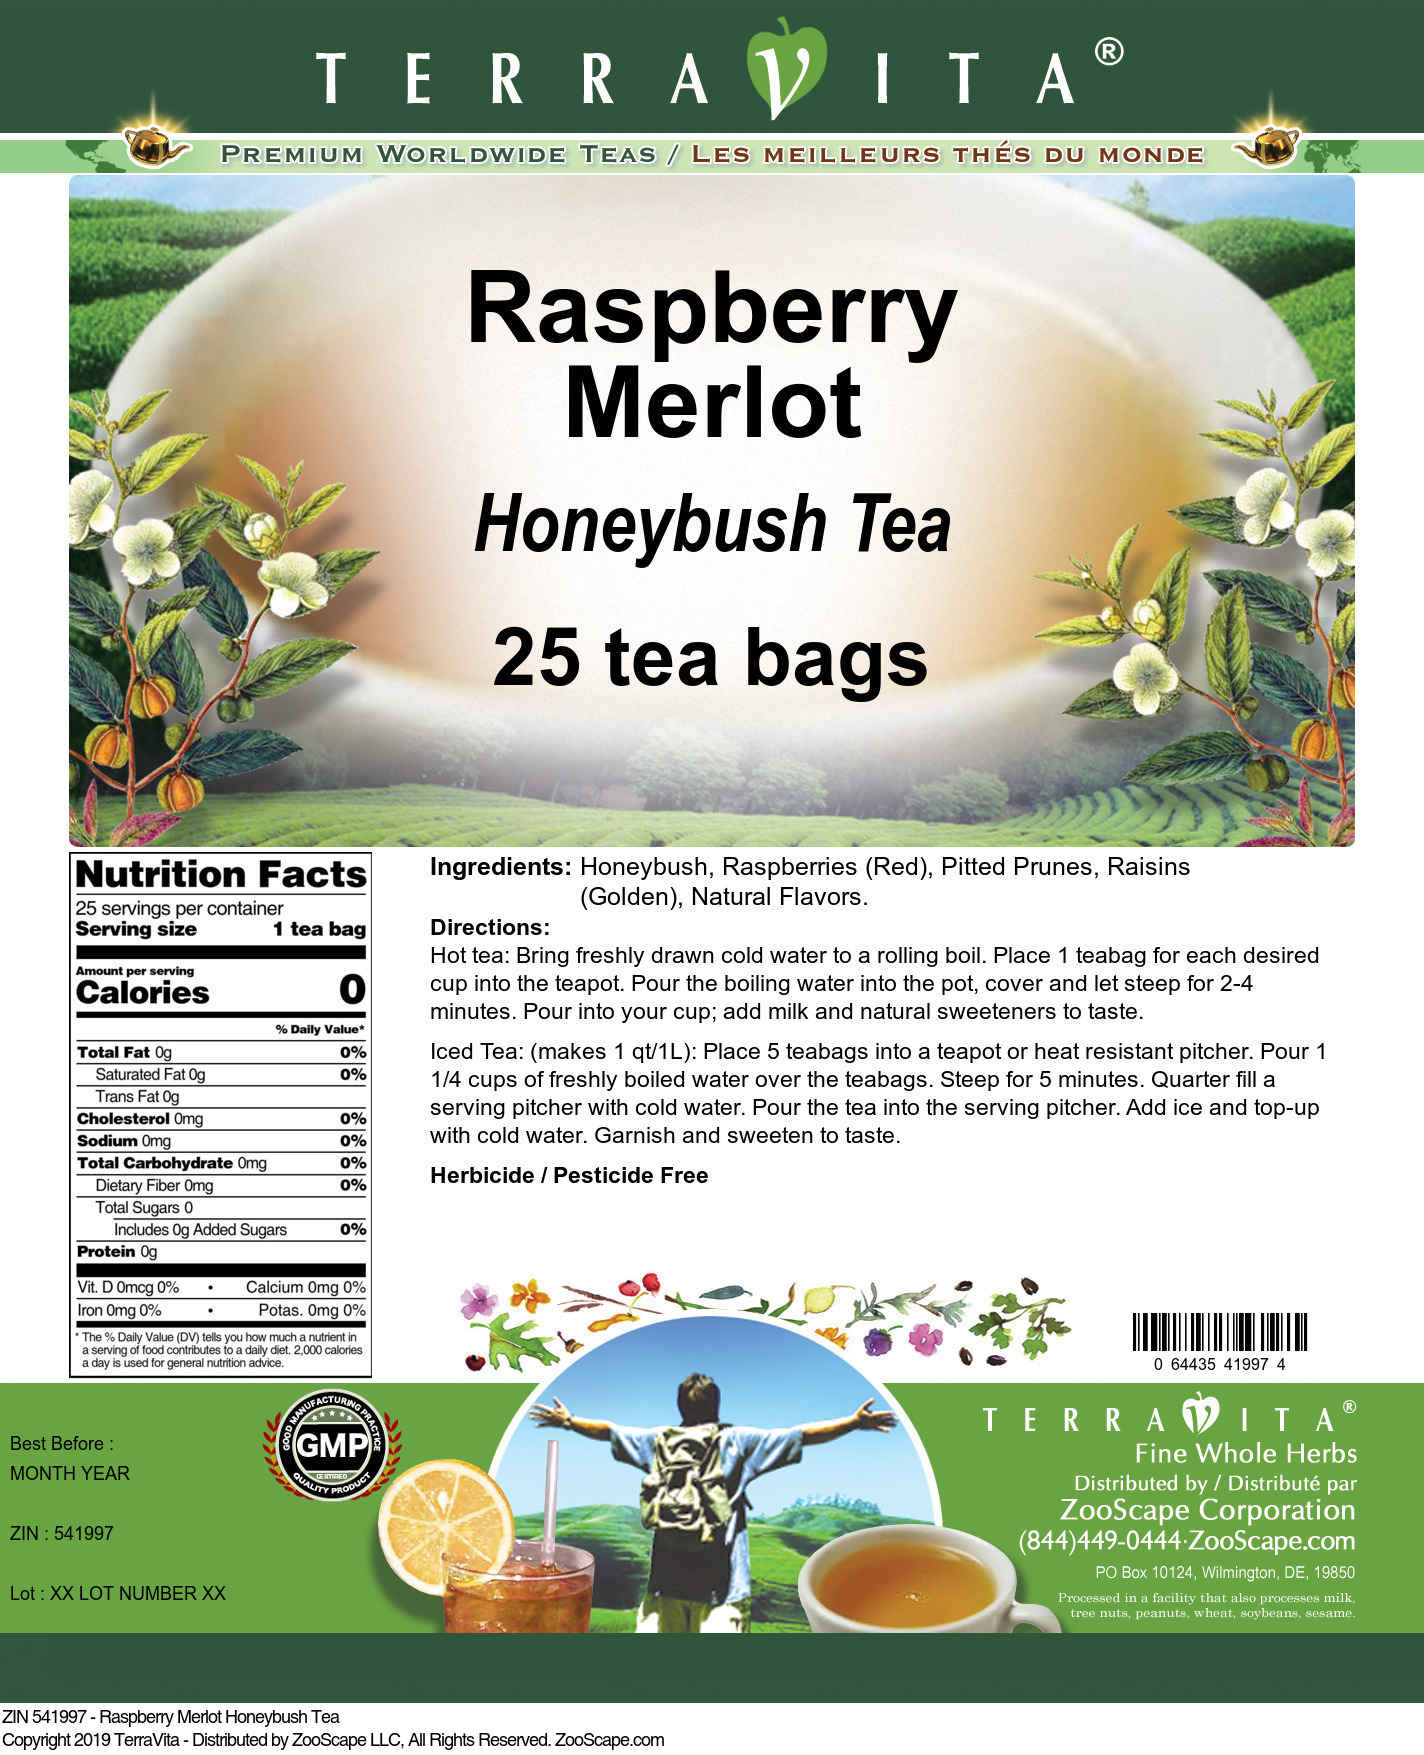 Raspberry Merlot Honeybush Tea